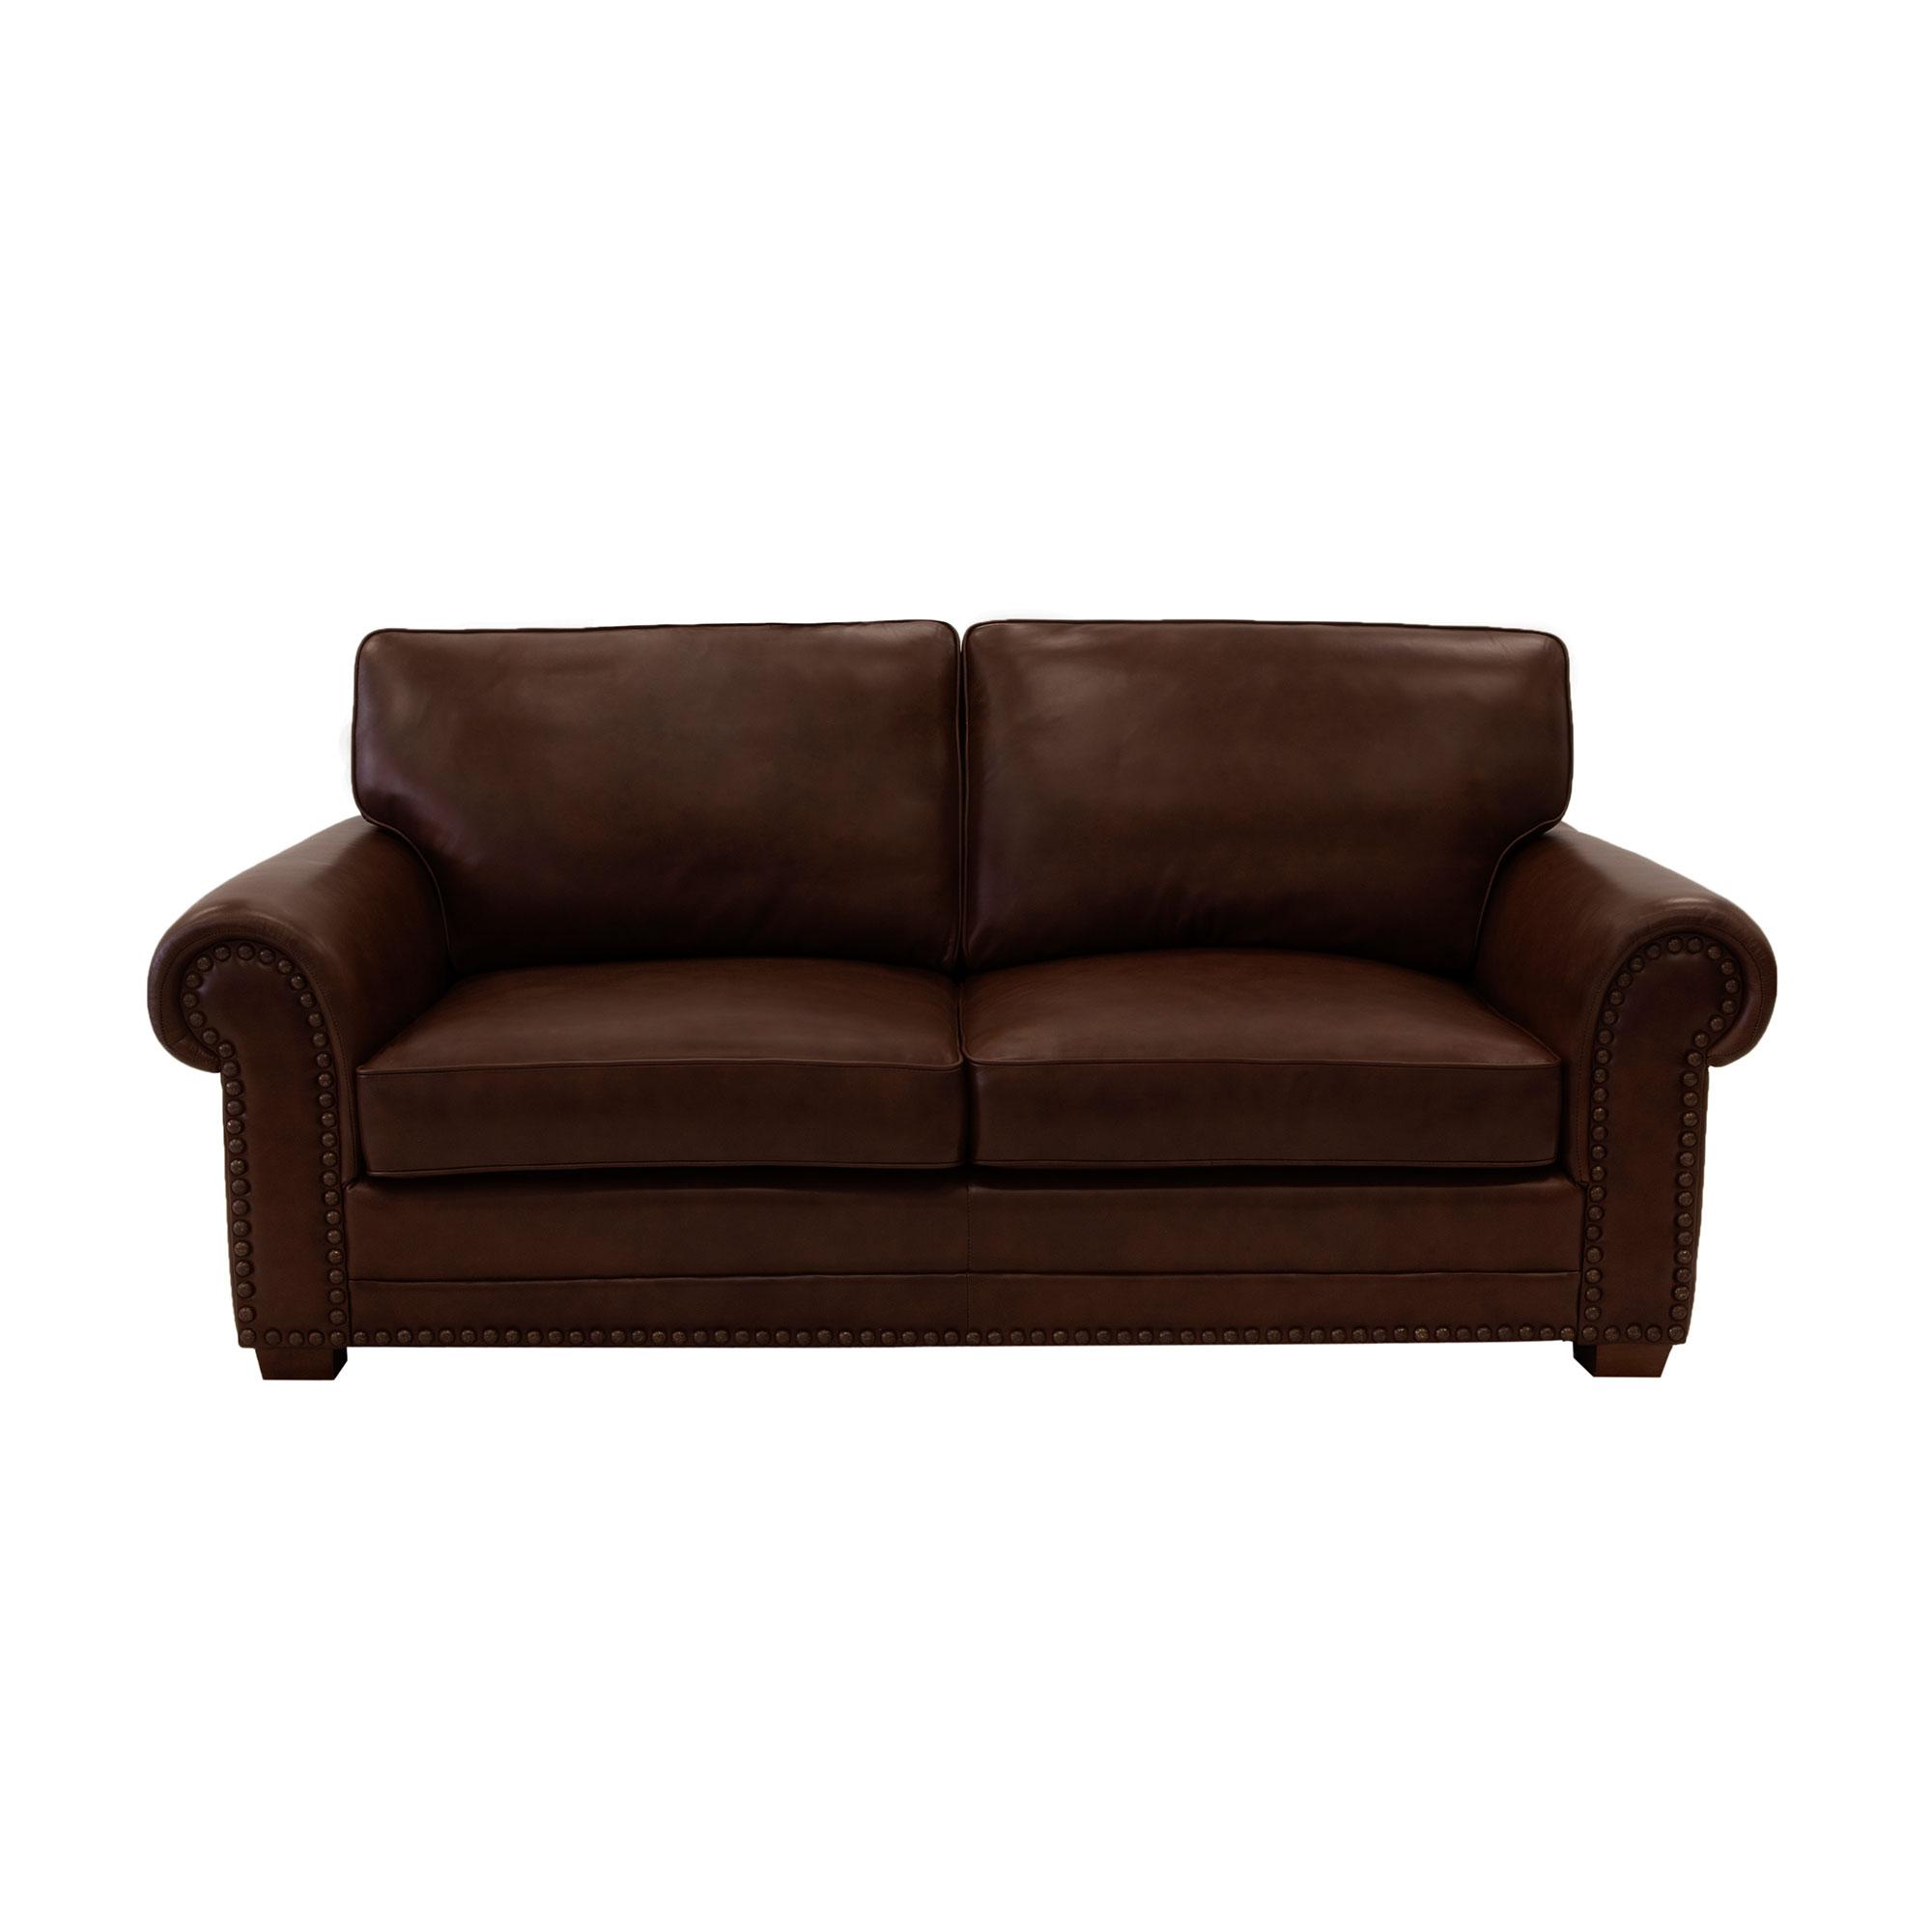 Marlin Sofa Moran Furniture